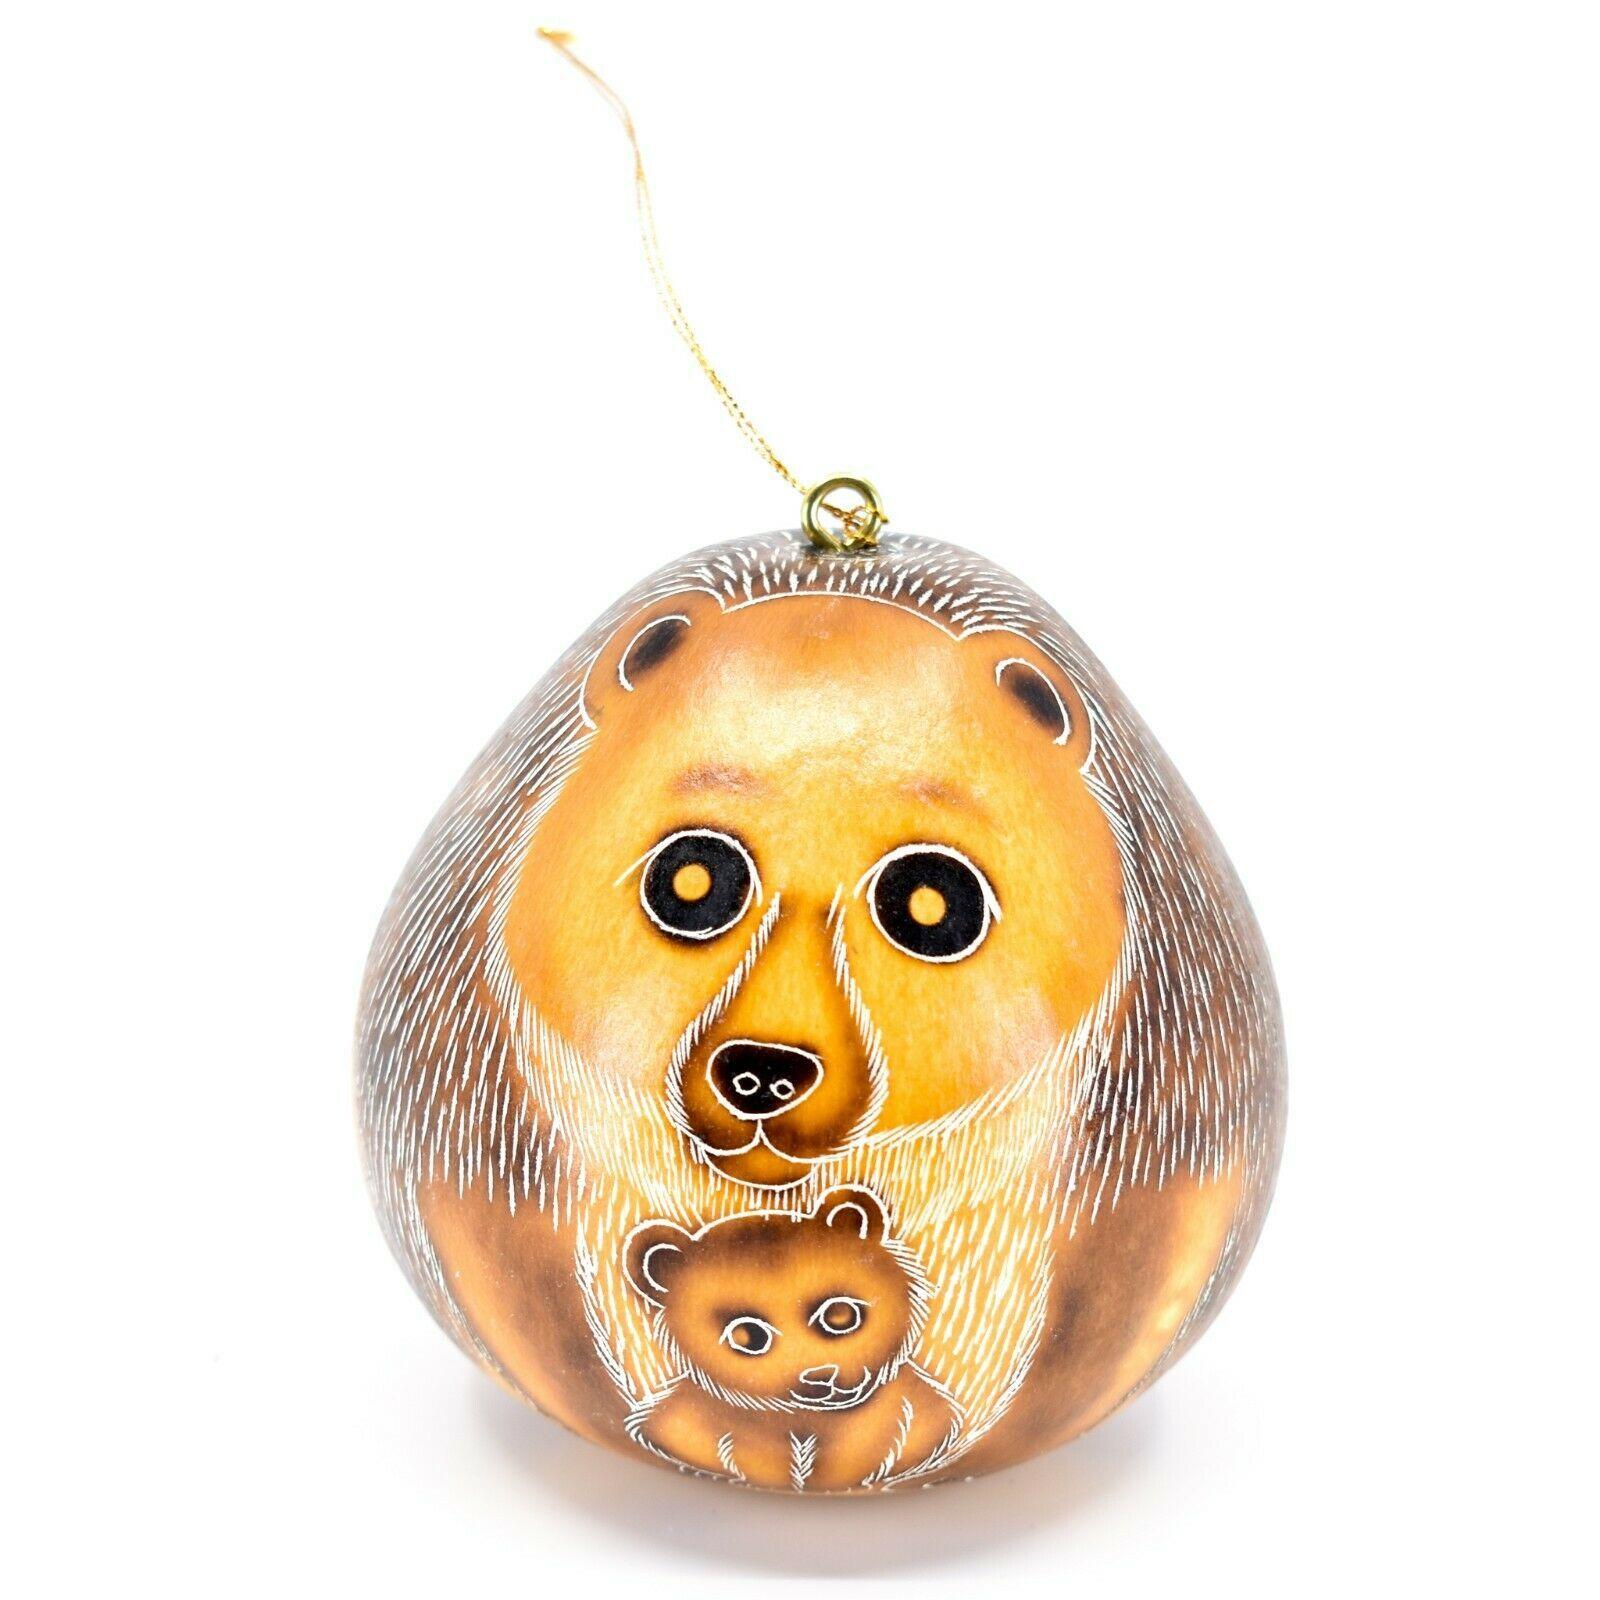 Handcrafted Carved Gourd Art Gorilla Bear Mom w Cub Animal Ornament Made in Peru